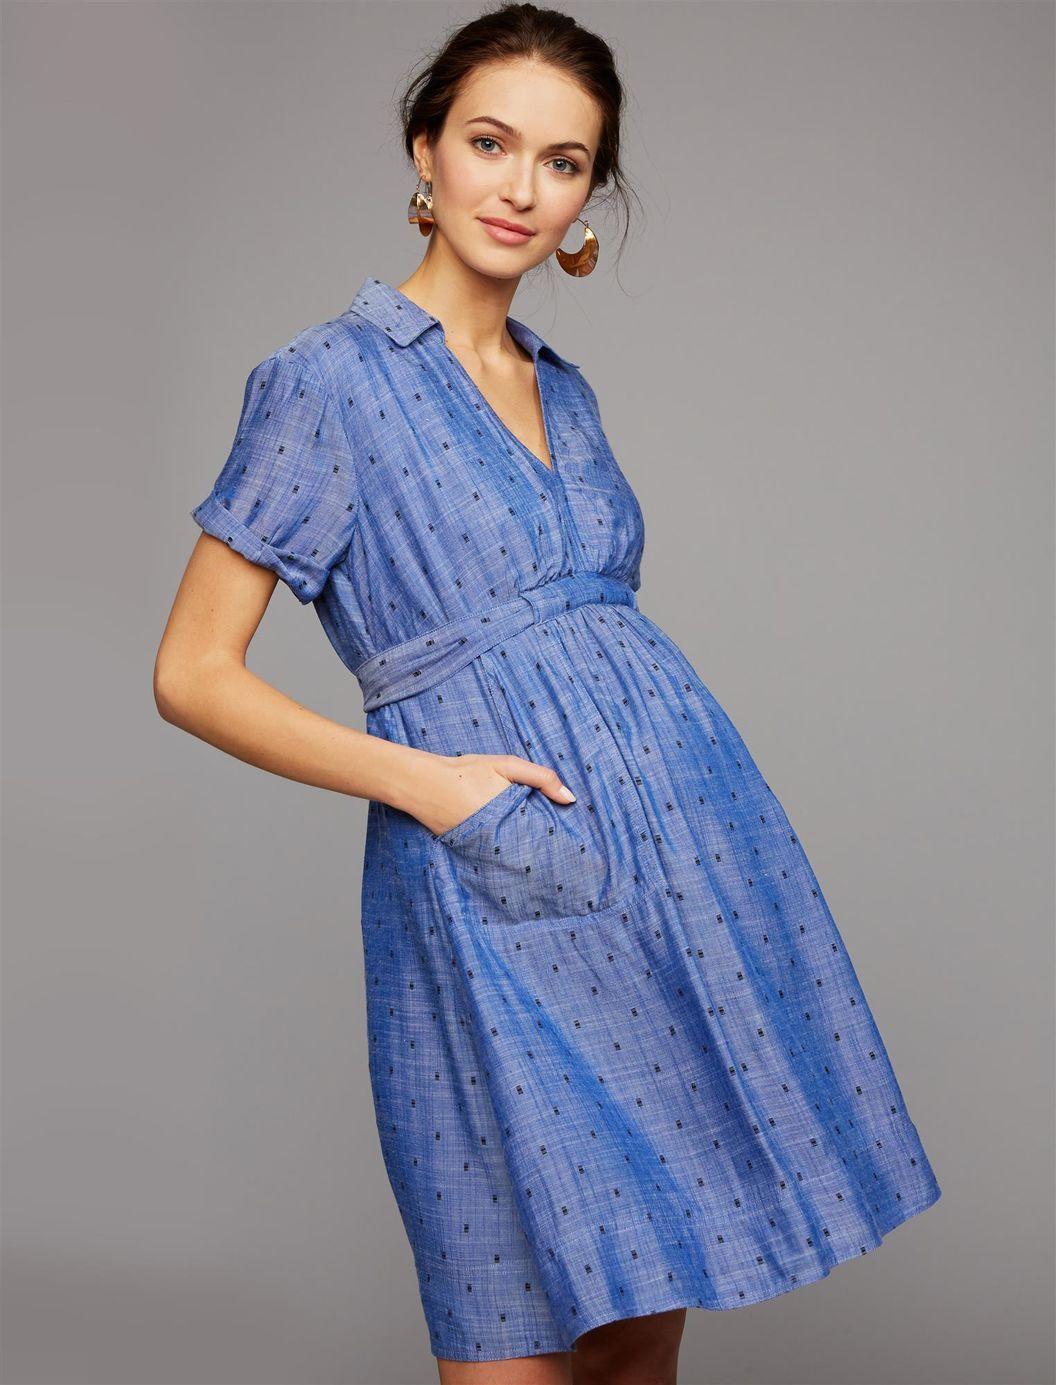 8740cfeec4fe8 Tie Detail Maternity Dress | Maternity Capsule | Maternity dresses ...